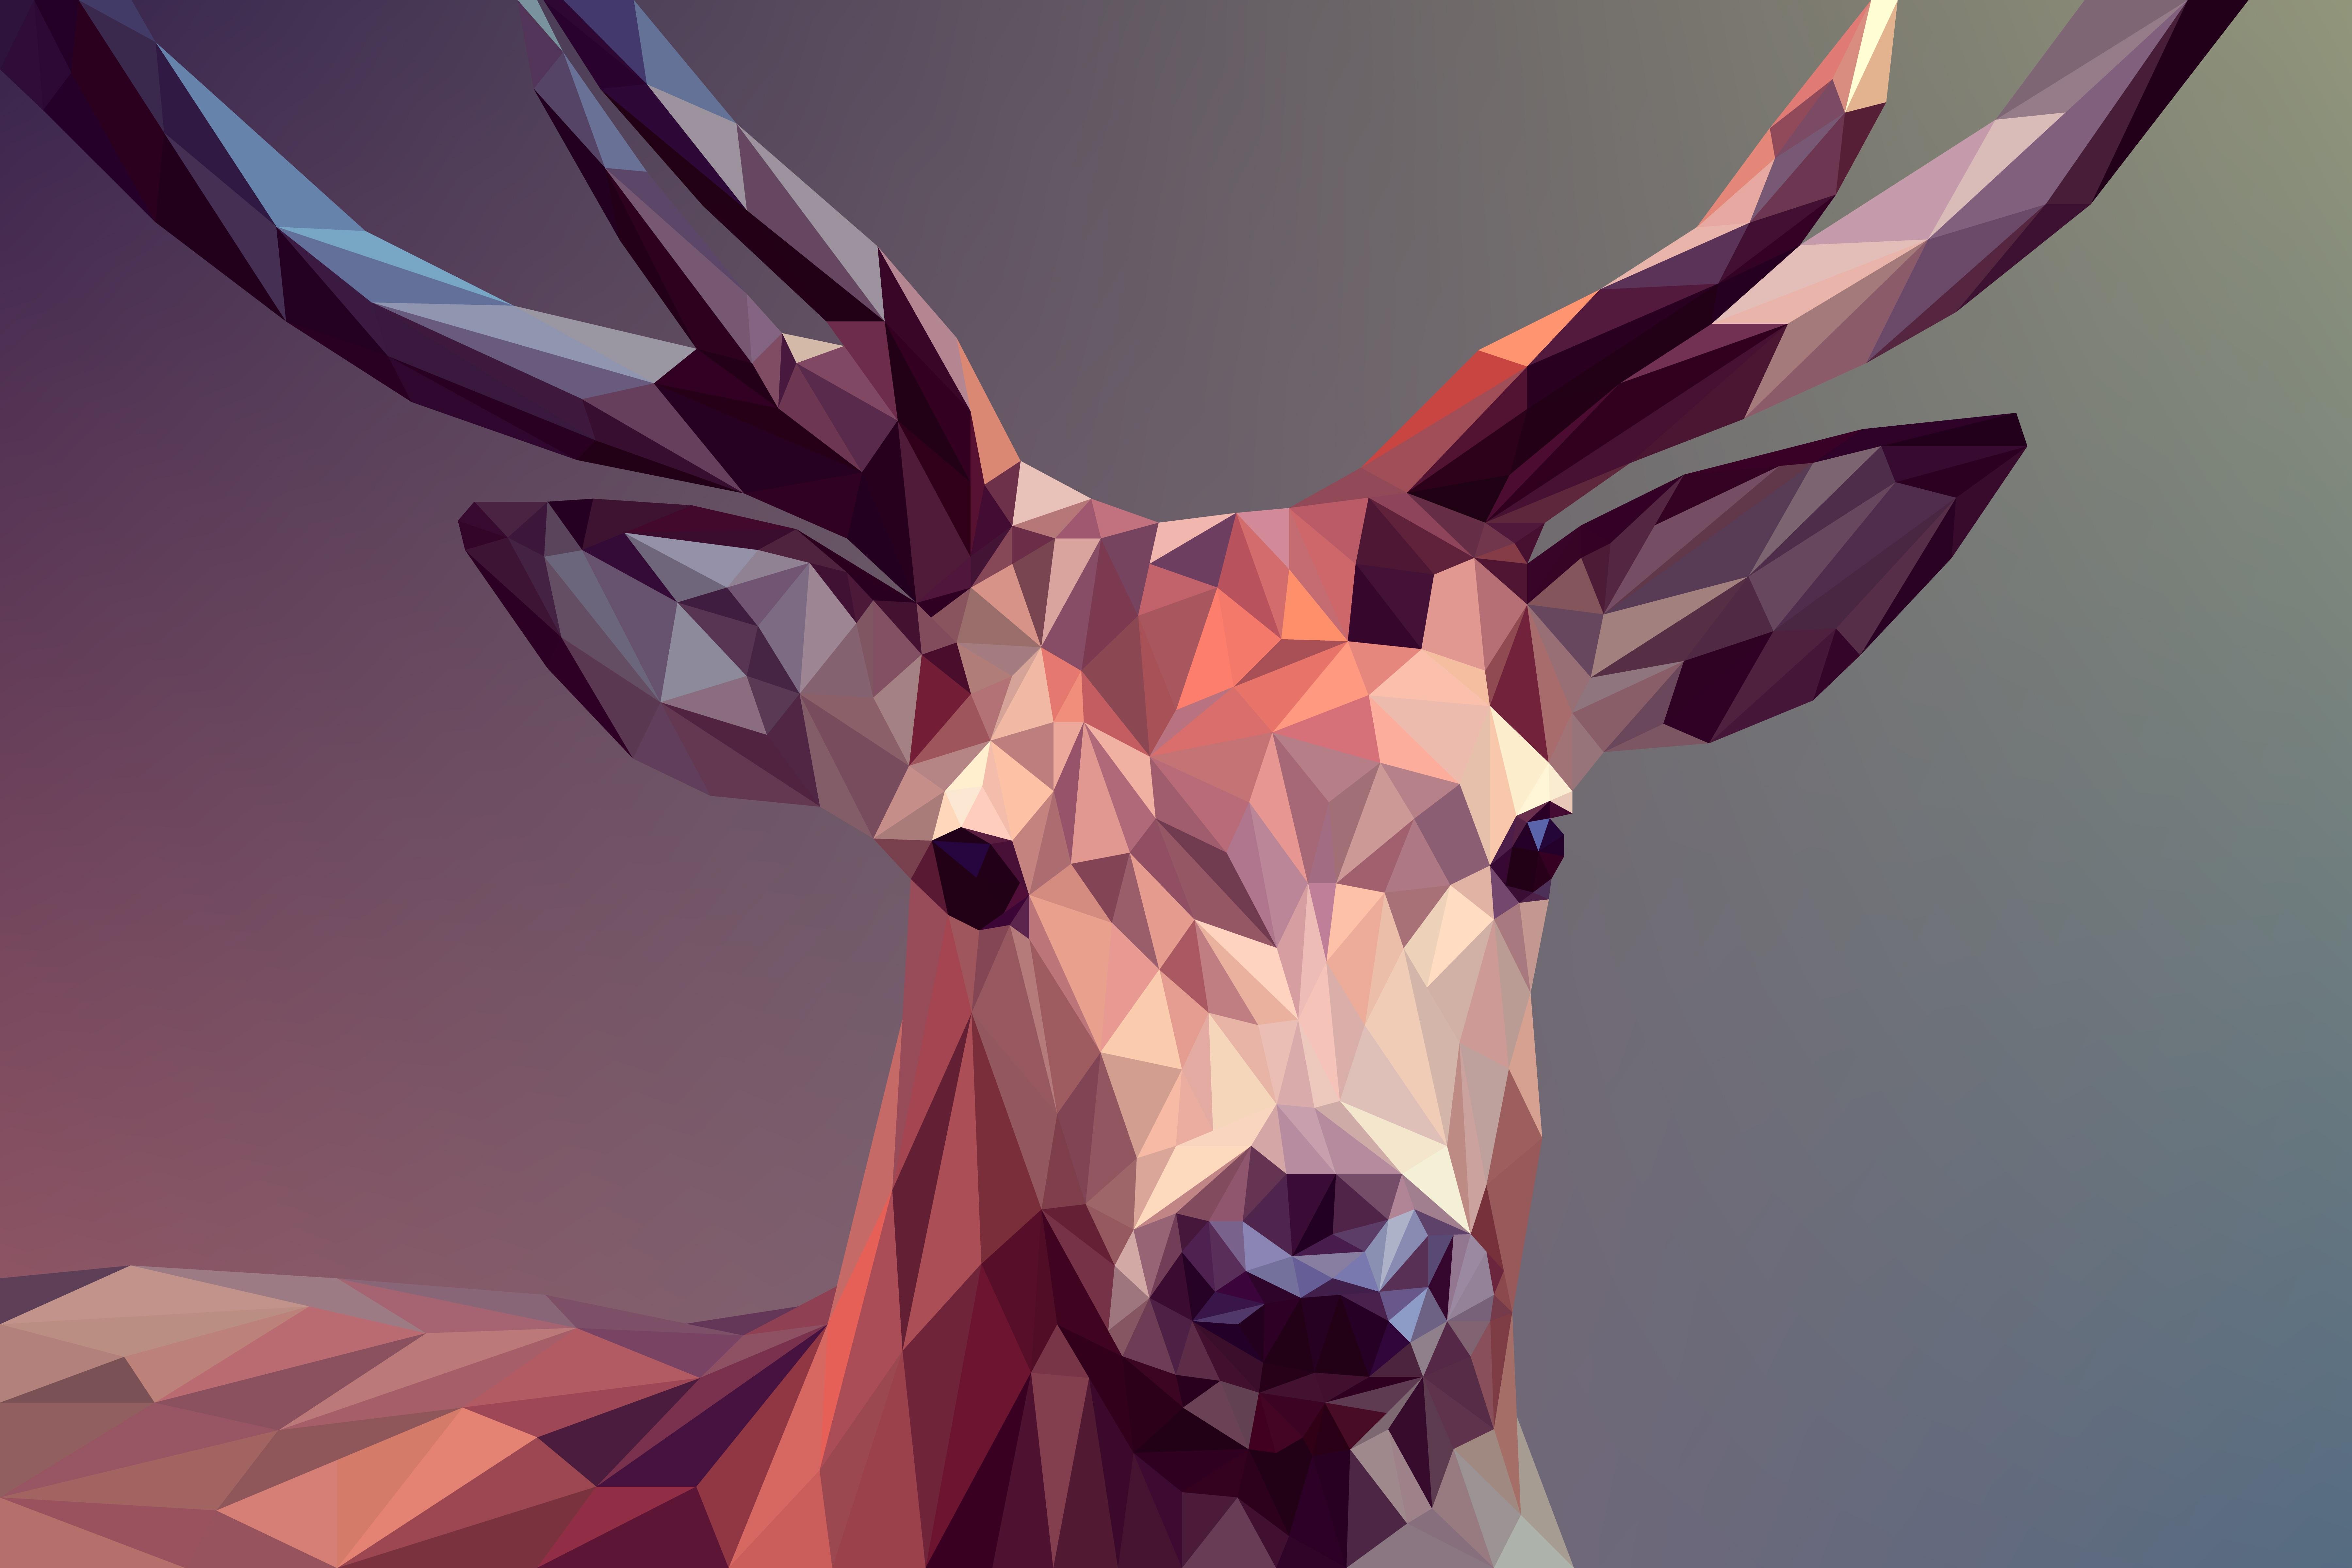 Low Poly Deer Wallpaper 5k Retina Ultra Fondo De Pantalla Hd